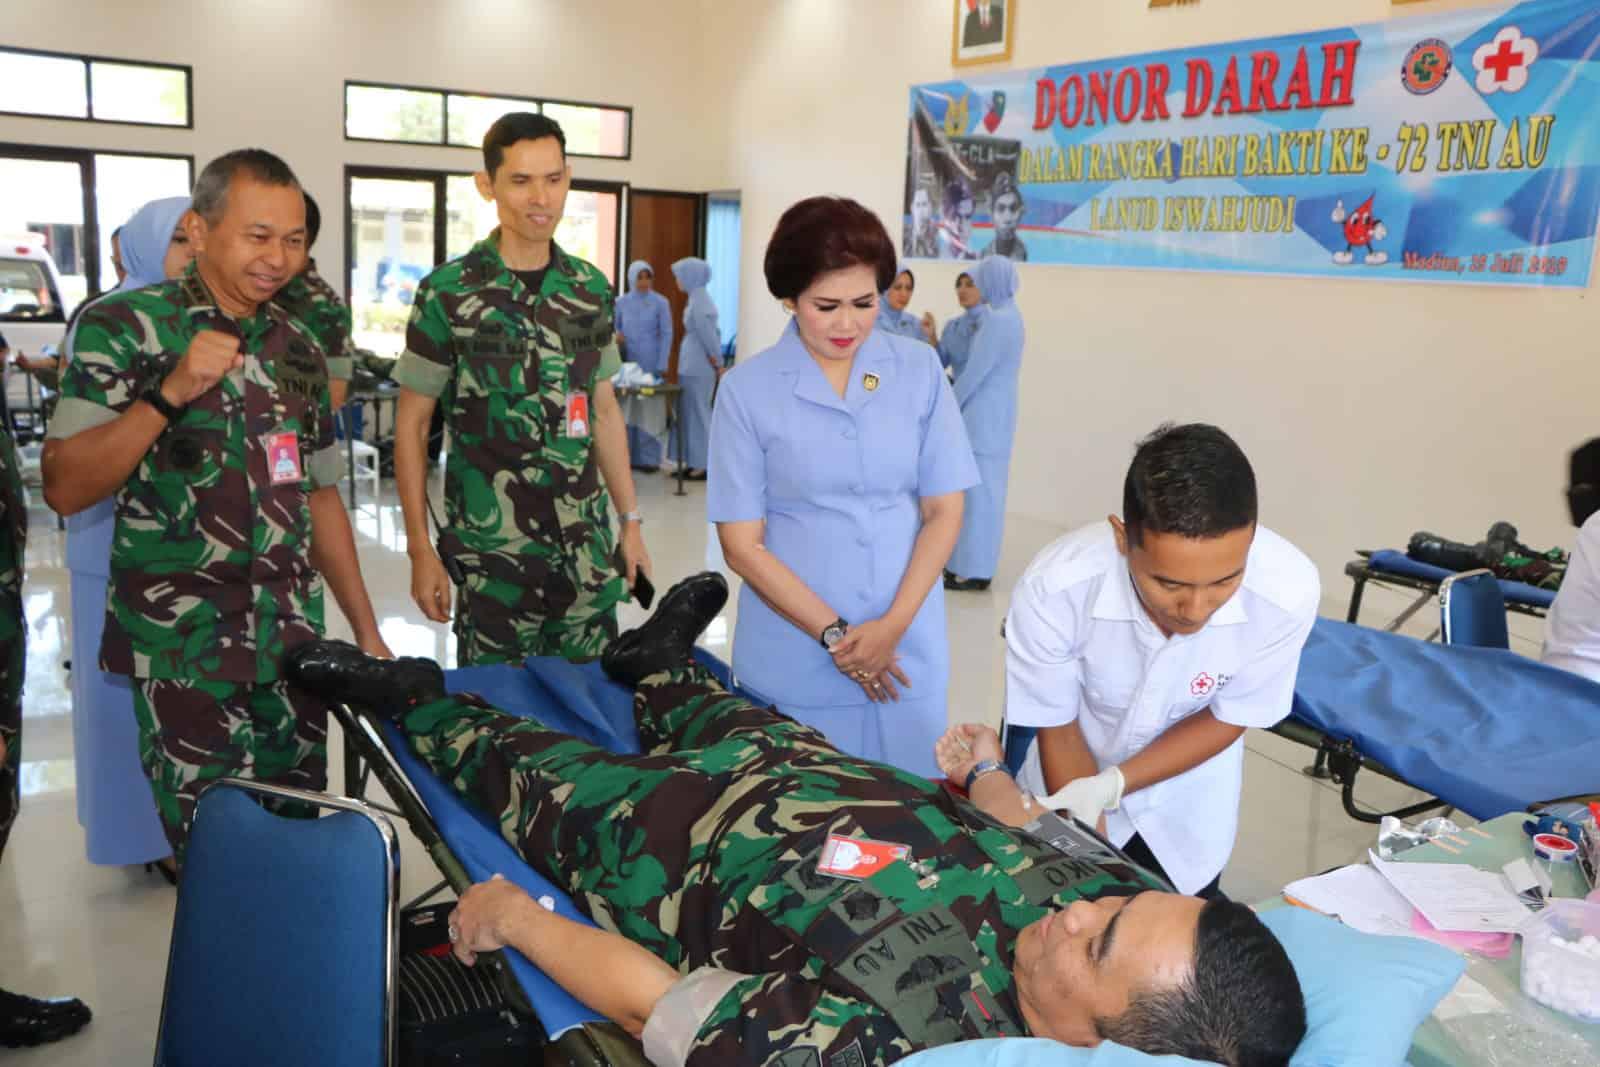 135 Kantong Darah Berhasil Di Kumpulkan Rsau Dr. Efram Harsana Lanud Iswahjudi